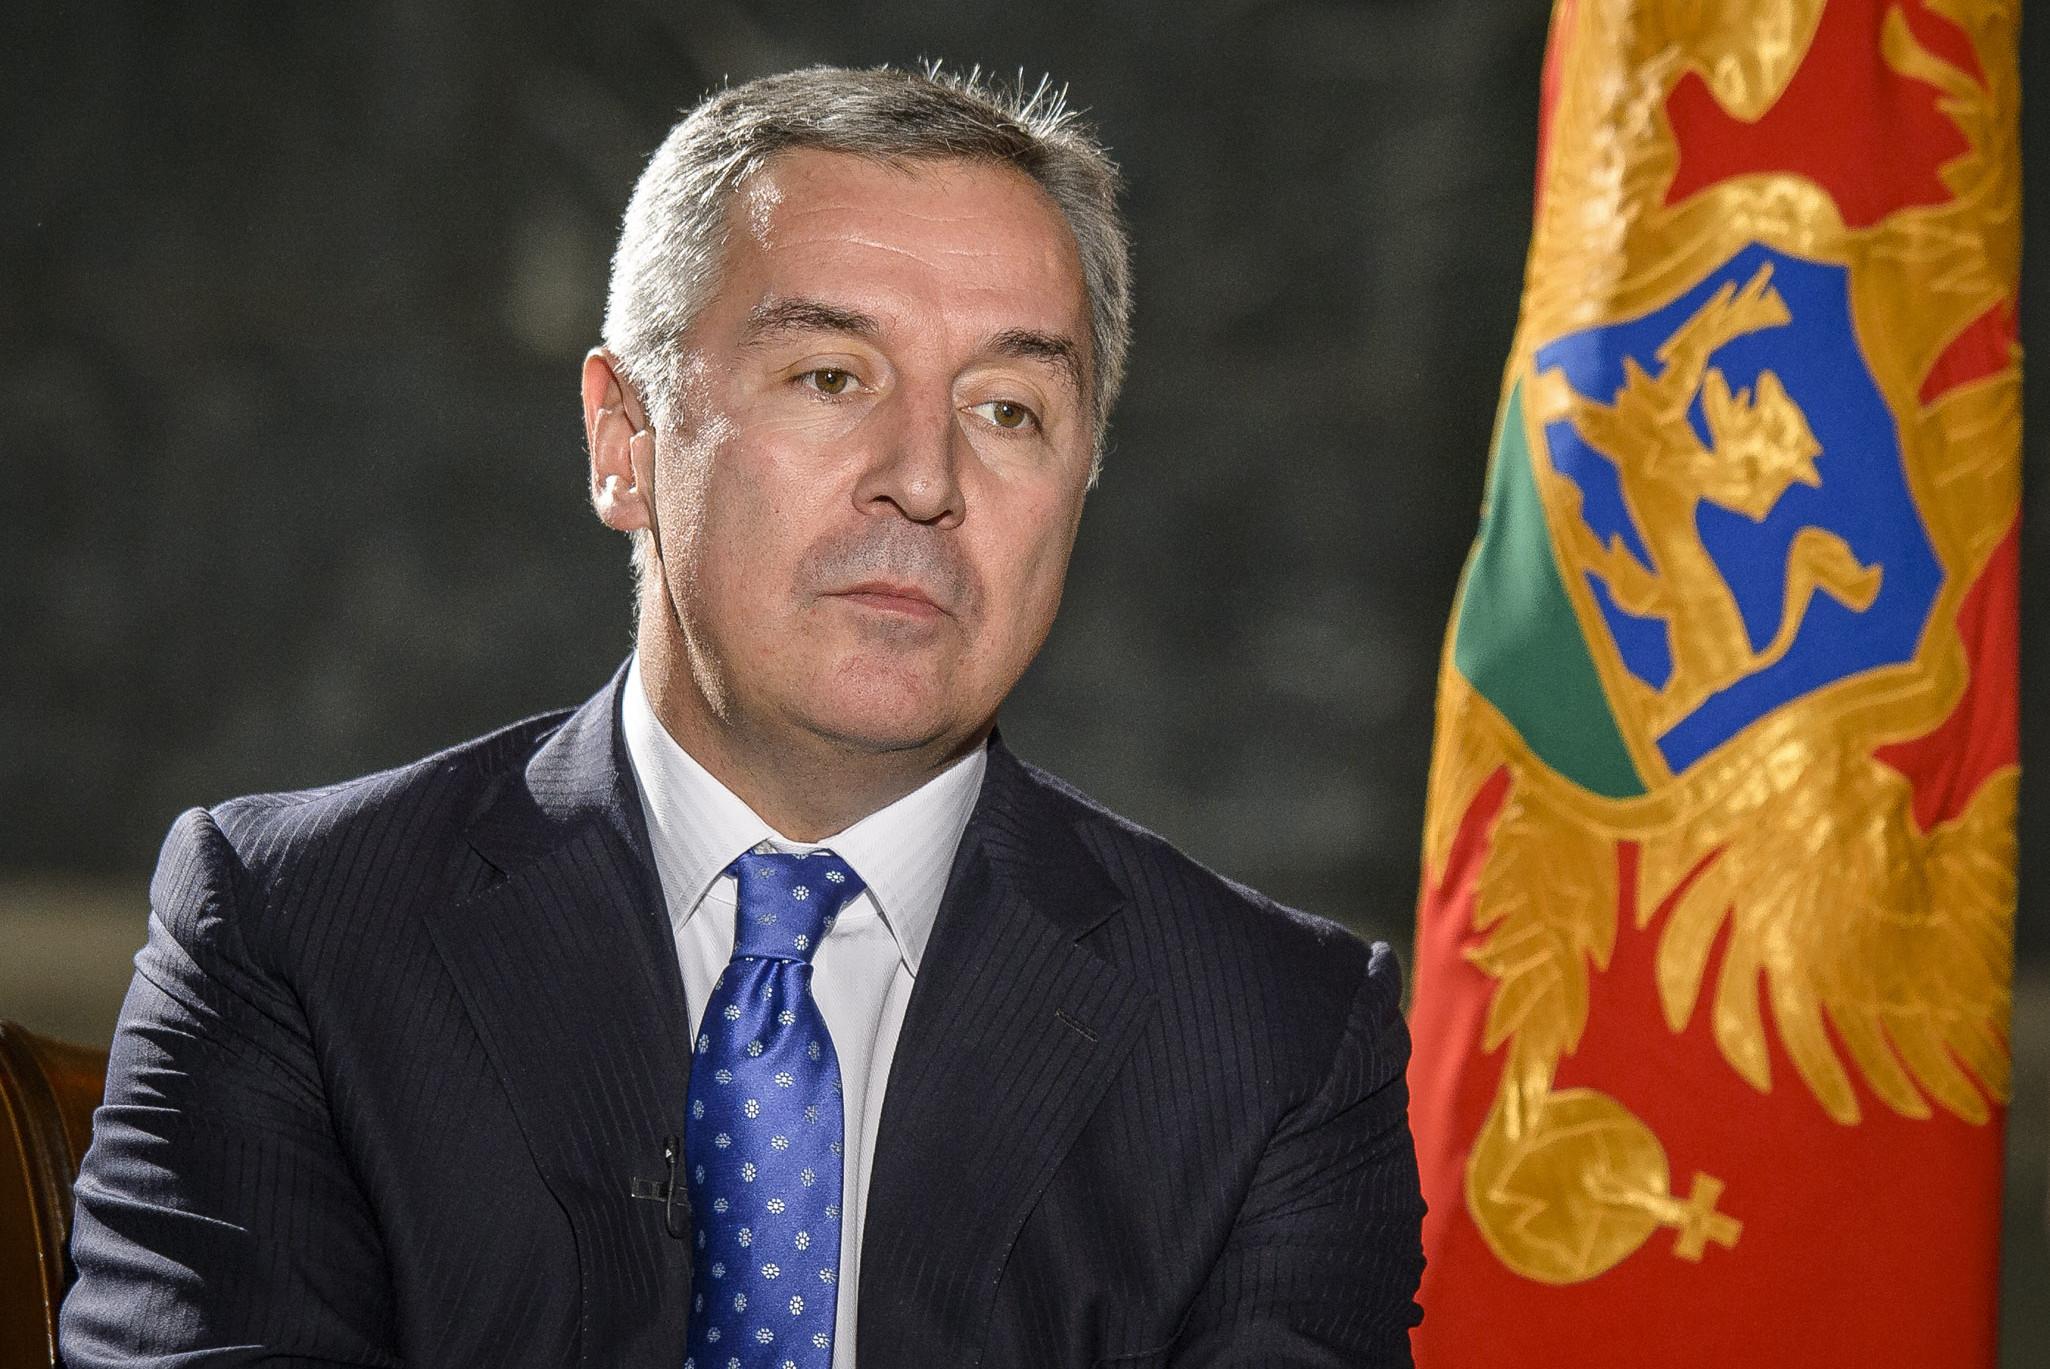 Председник Црне Горе Мило Ђукановић (Фото: oslobodjenje.ba)